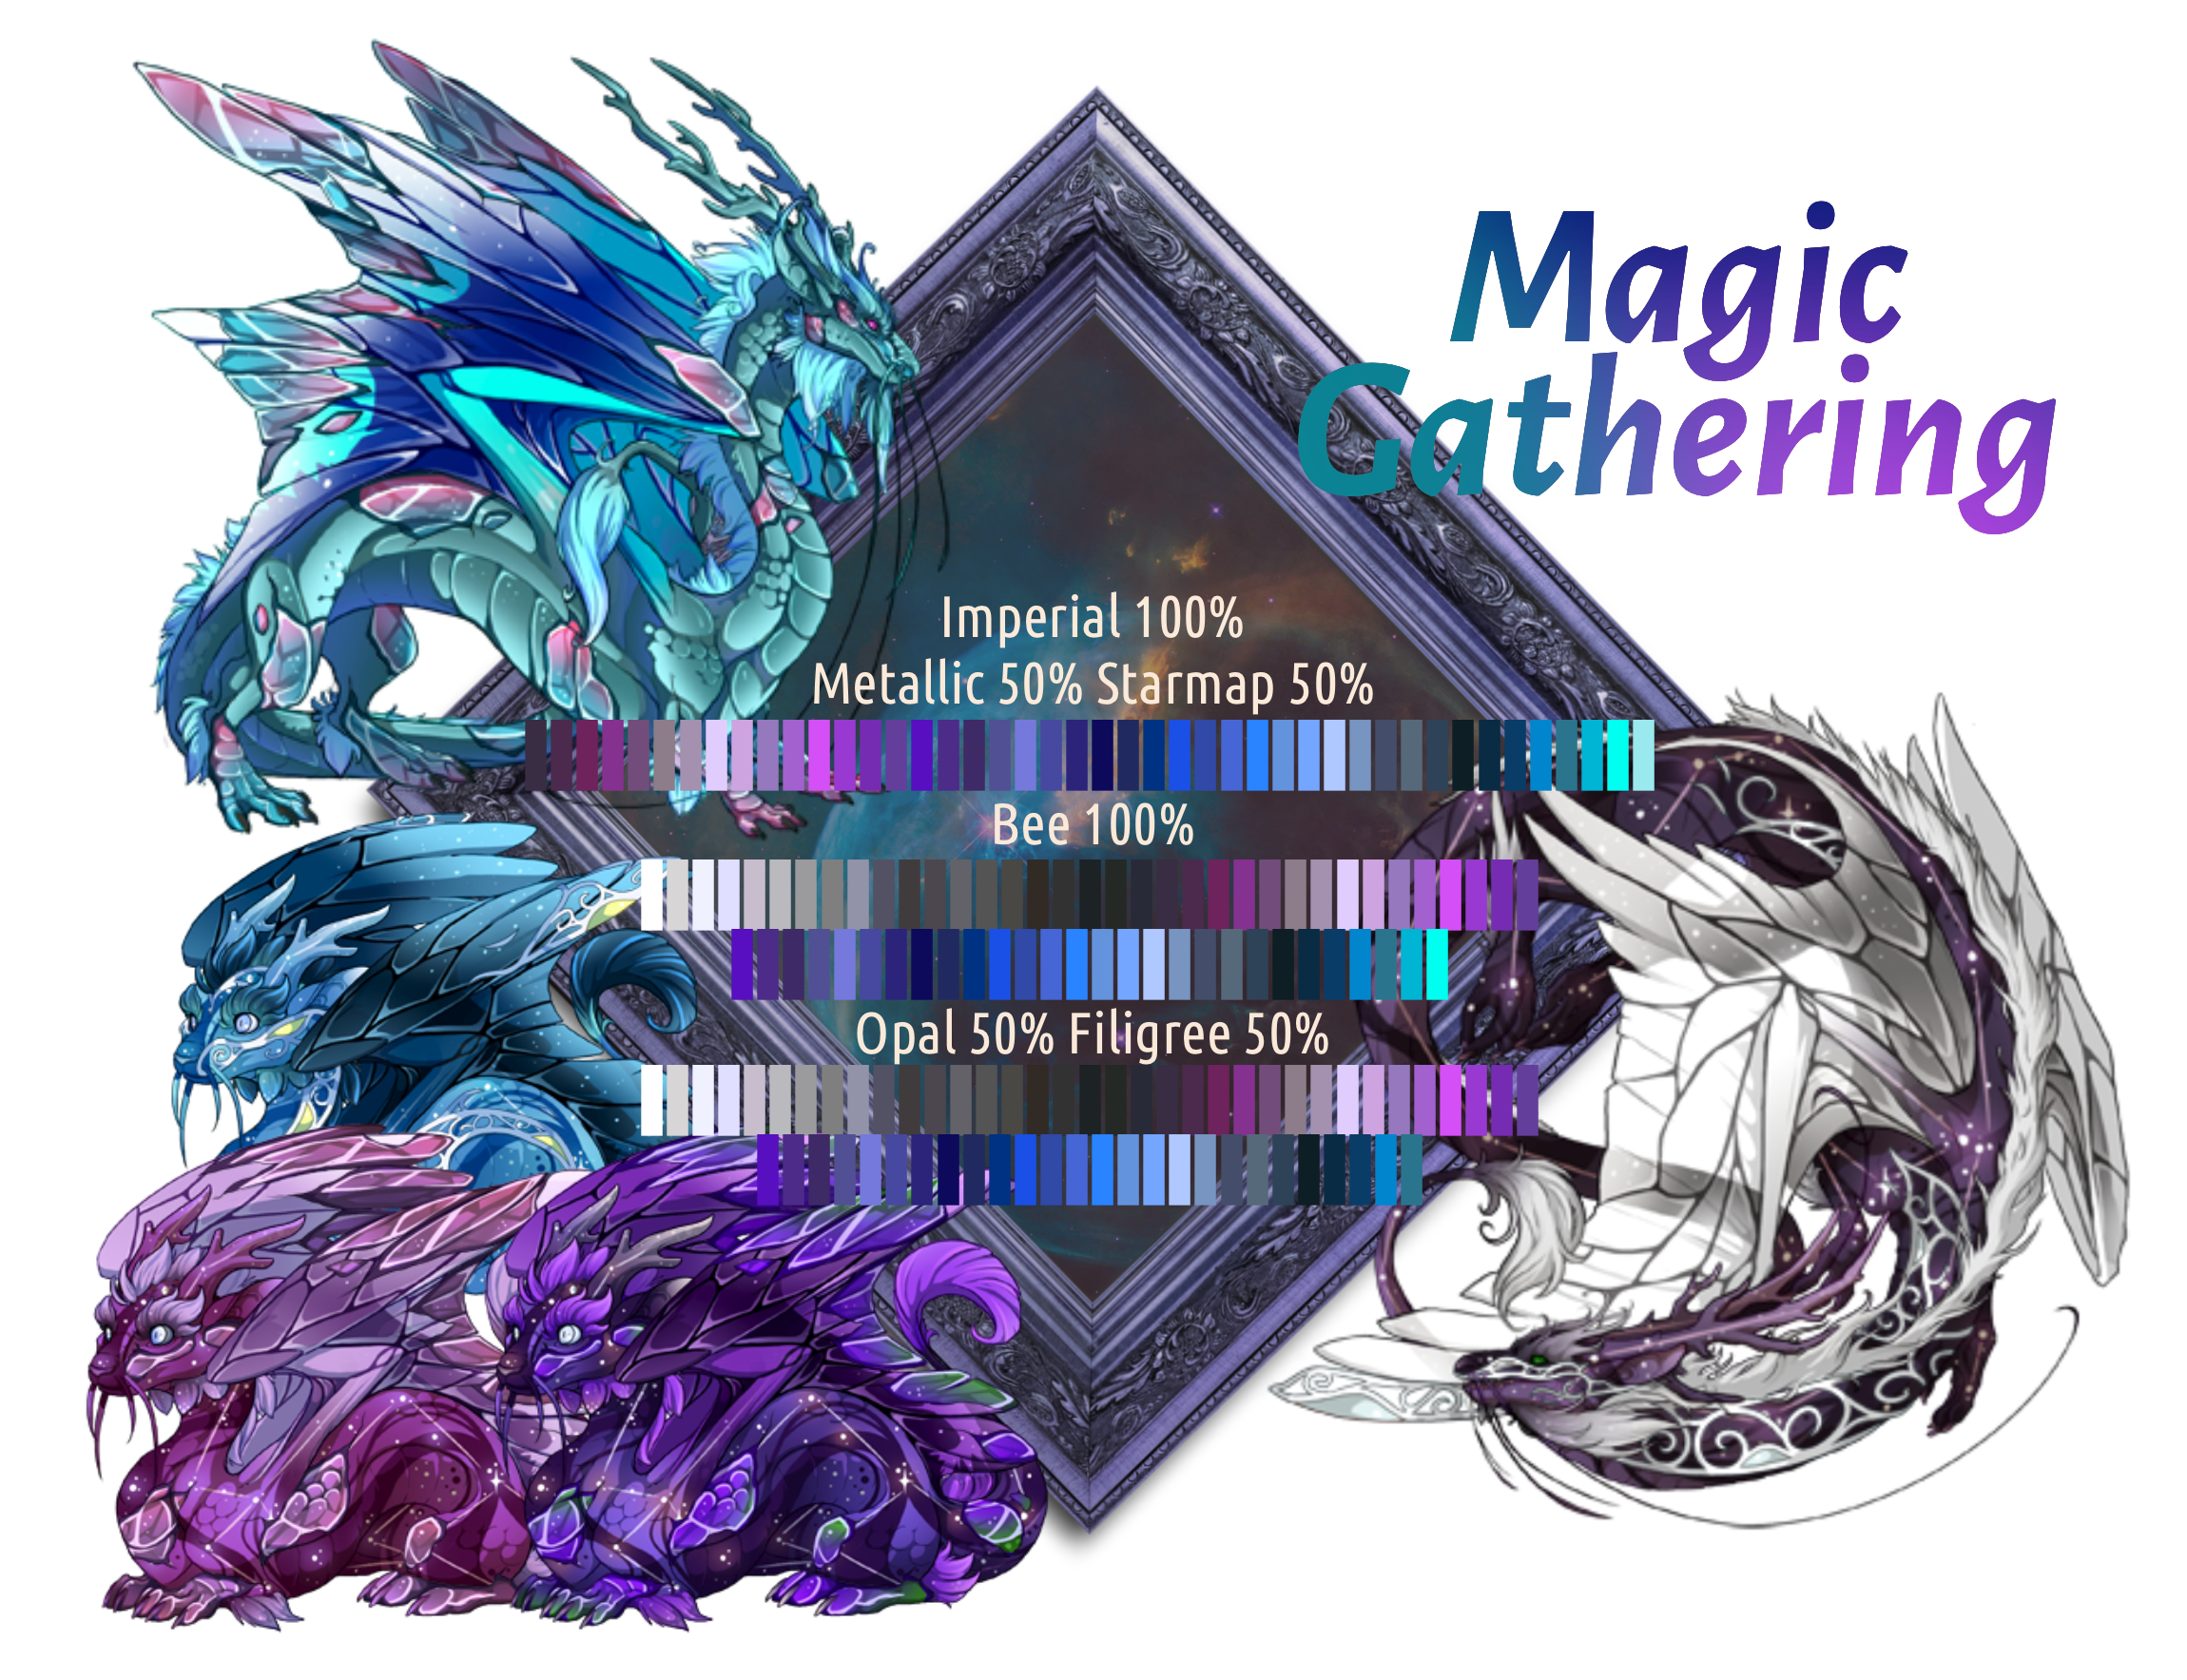 Breeding_card_Magic_Gathering.png